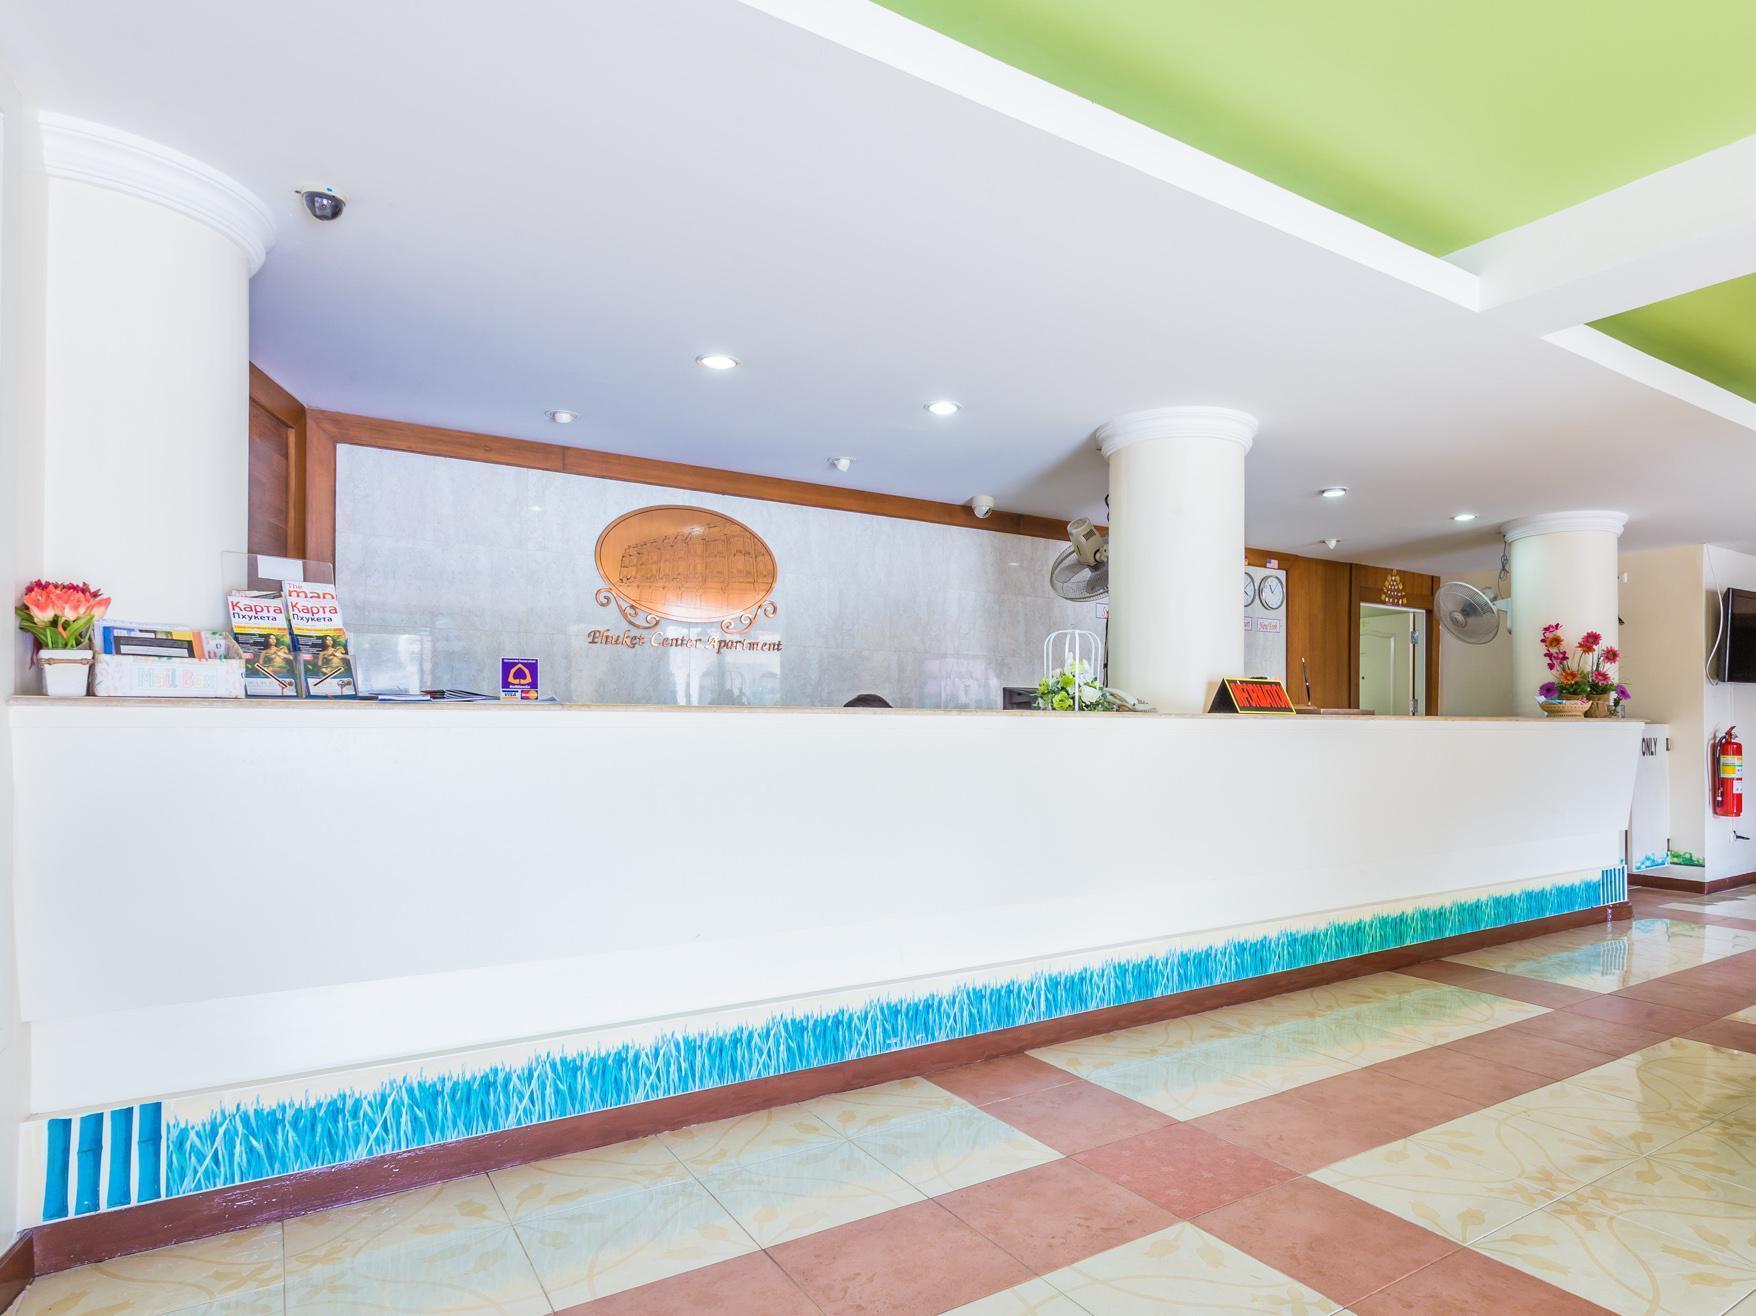 Phuket Center Hotel ภูเก็ต เซ็นเตอร์ โฮเต็ล